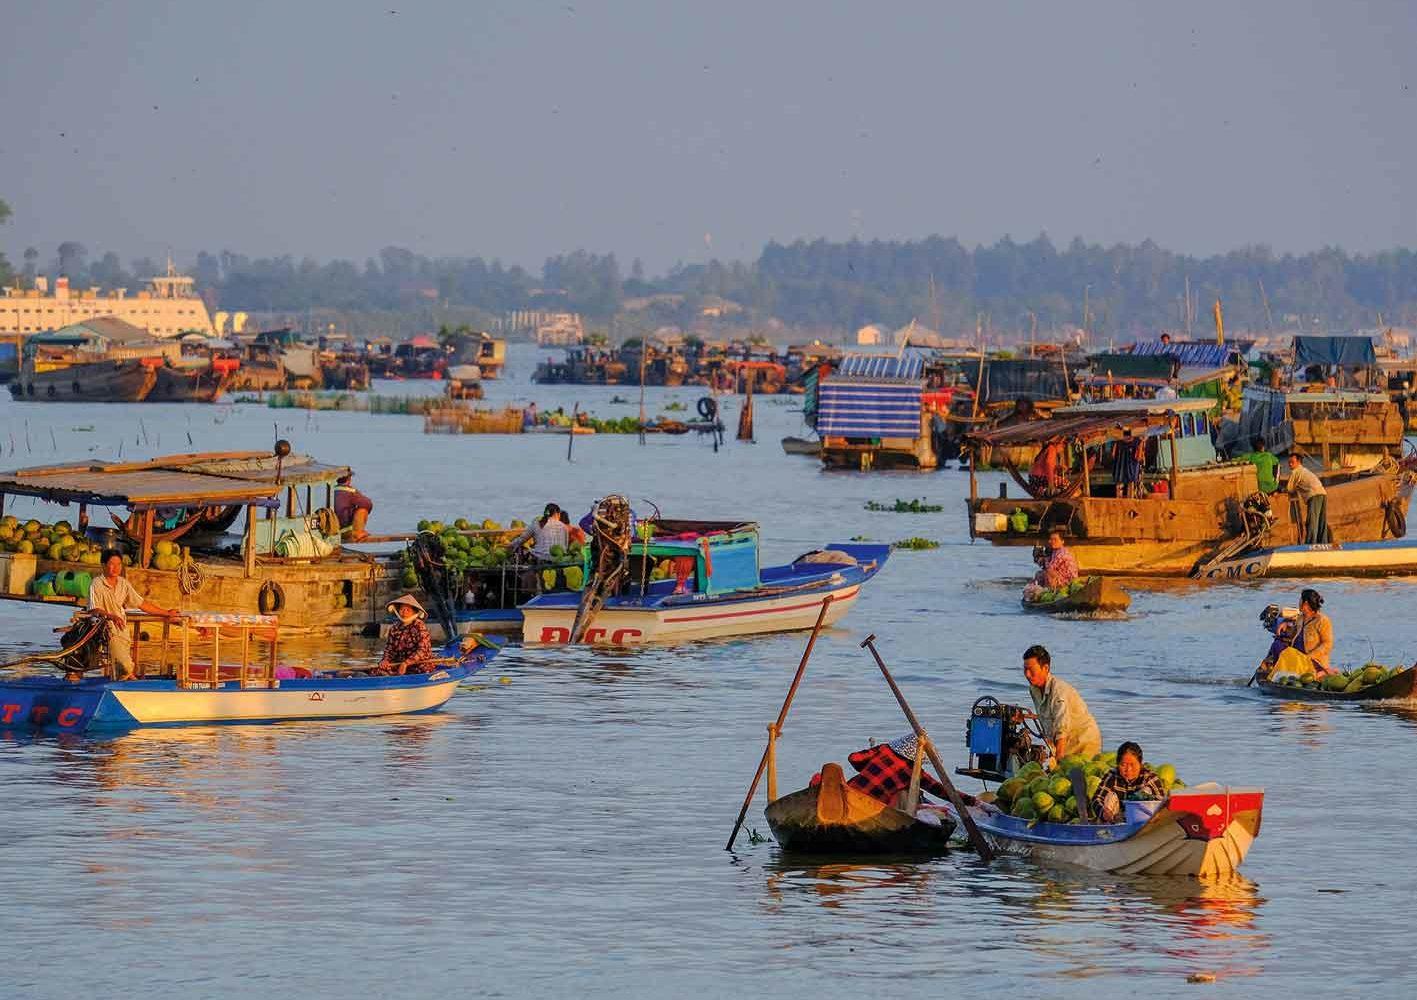 Selbst auf dem Mekong finden grosse Märkte statt.